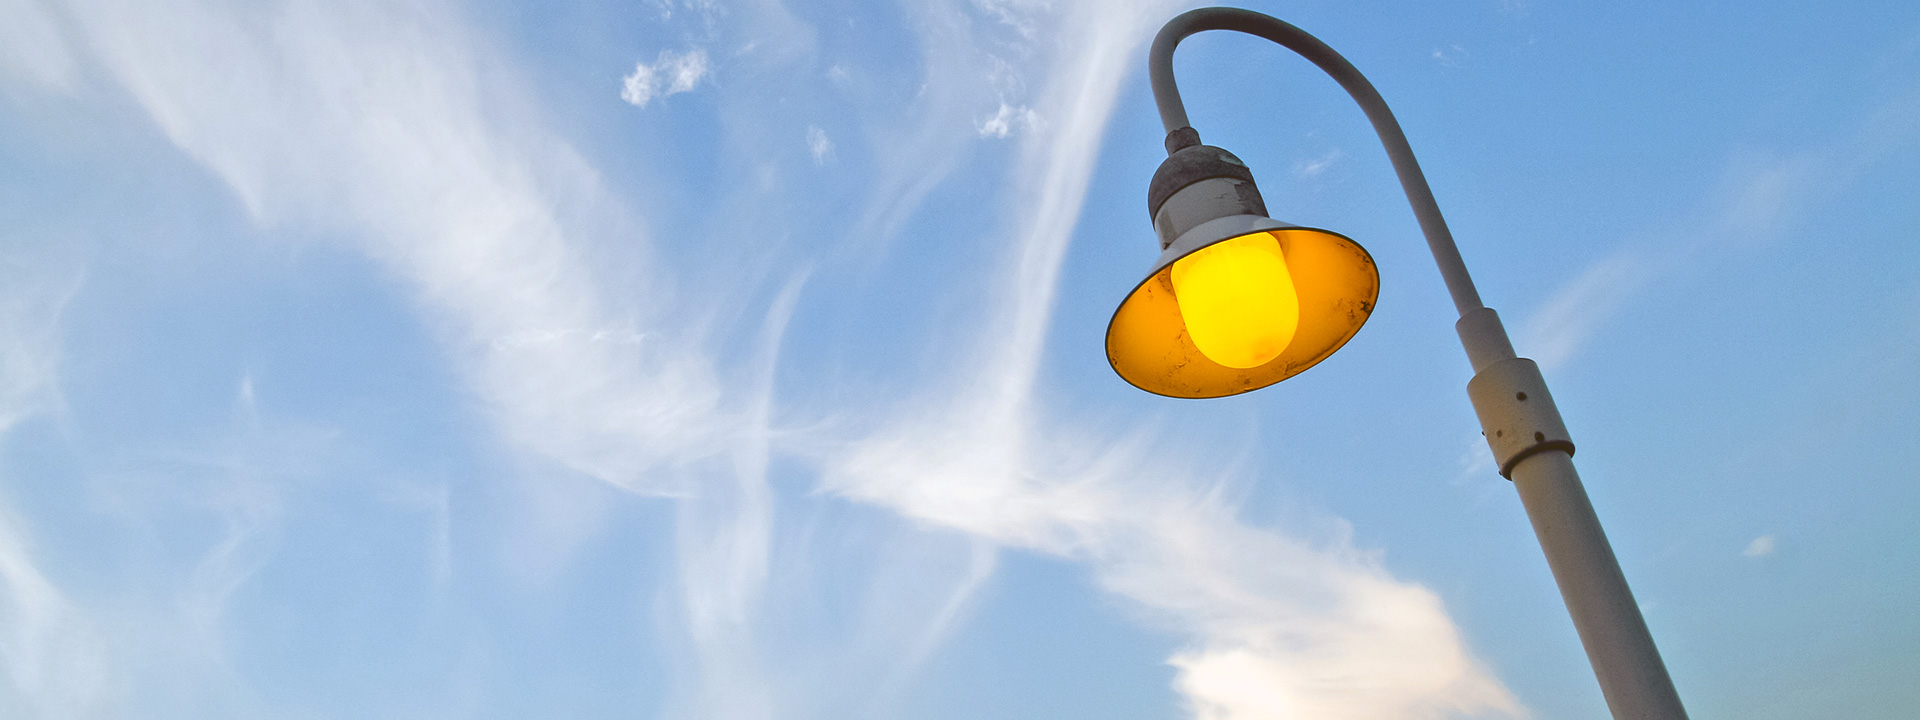 header-strassenlampe.jpg